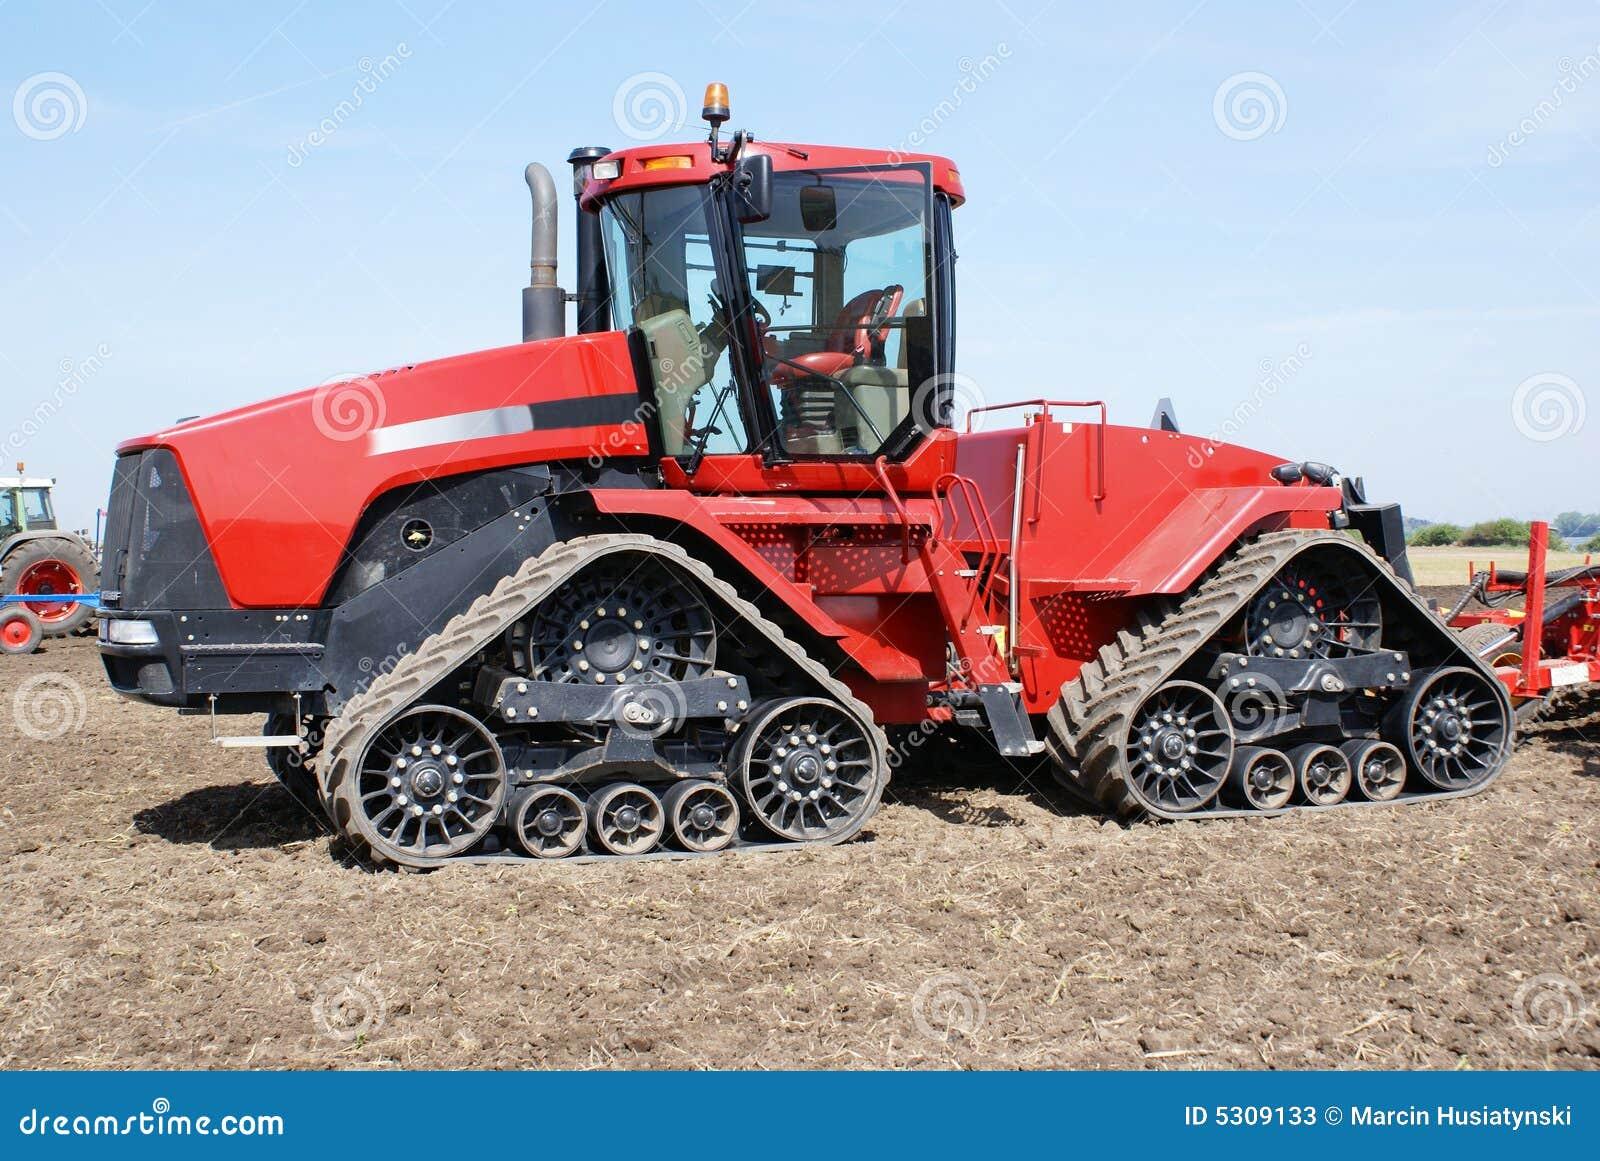 caterpillar tractor case in cba